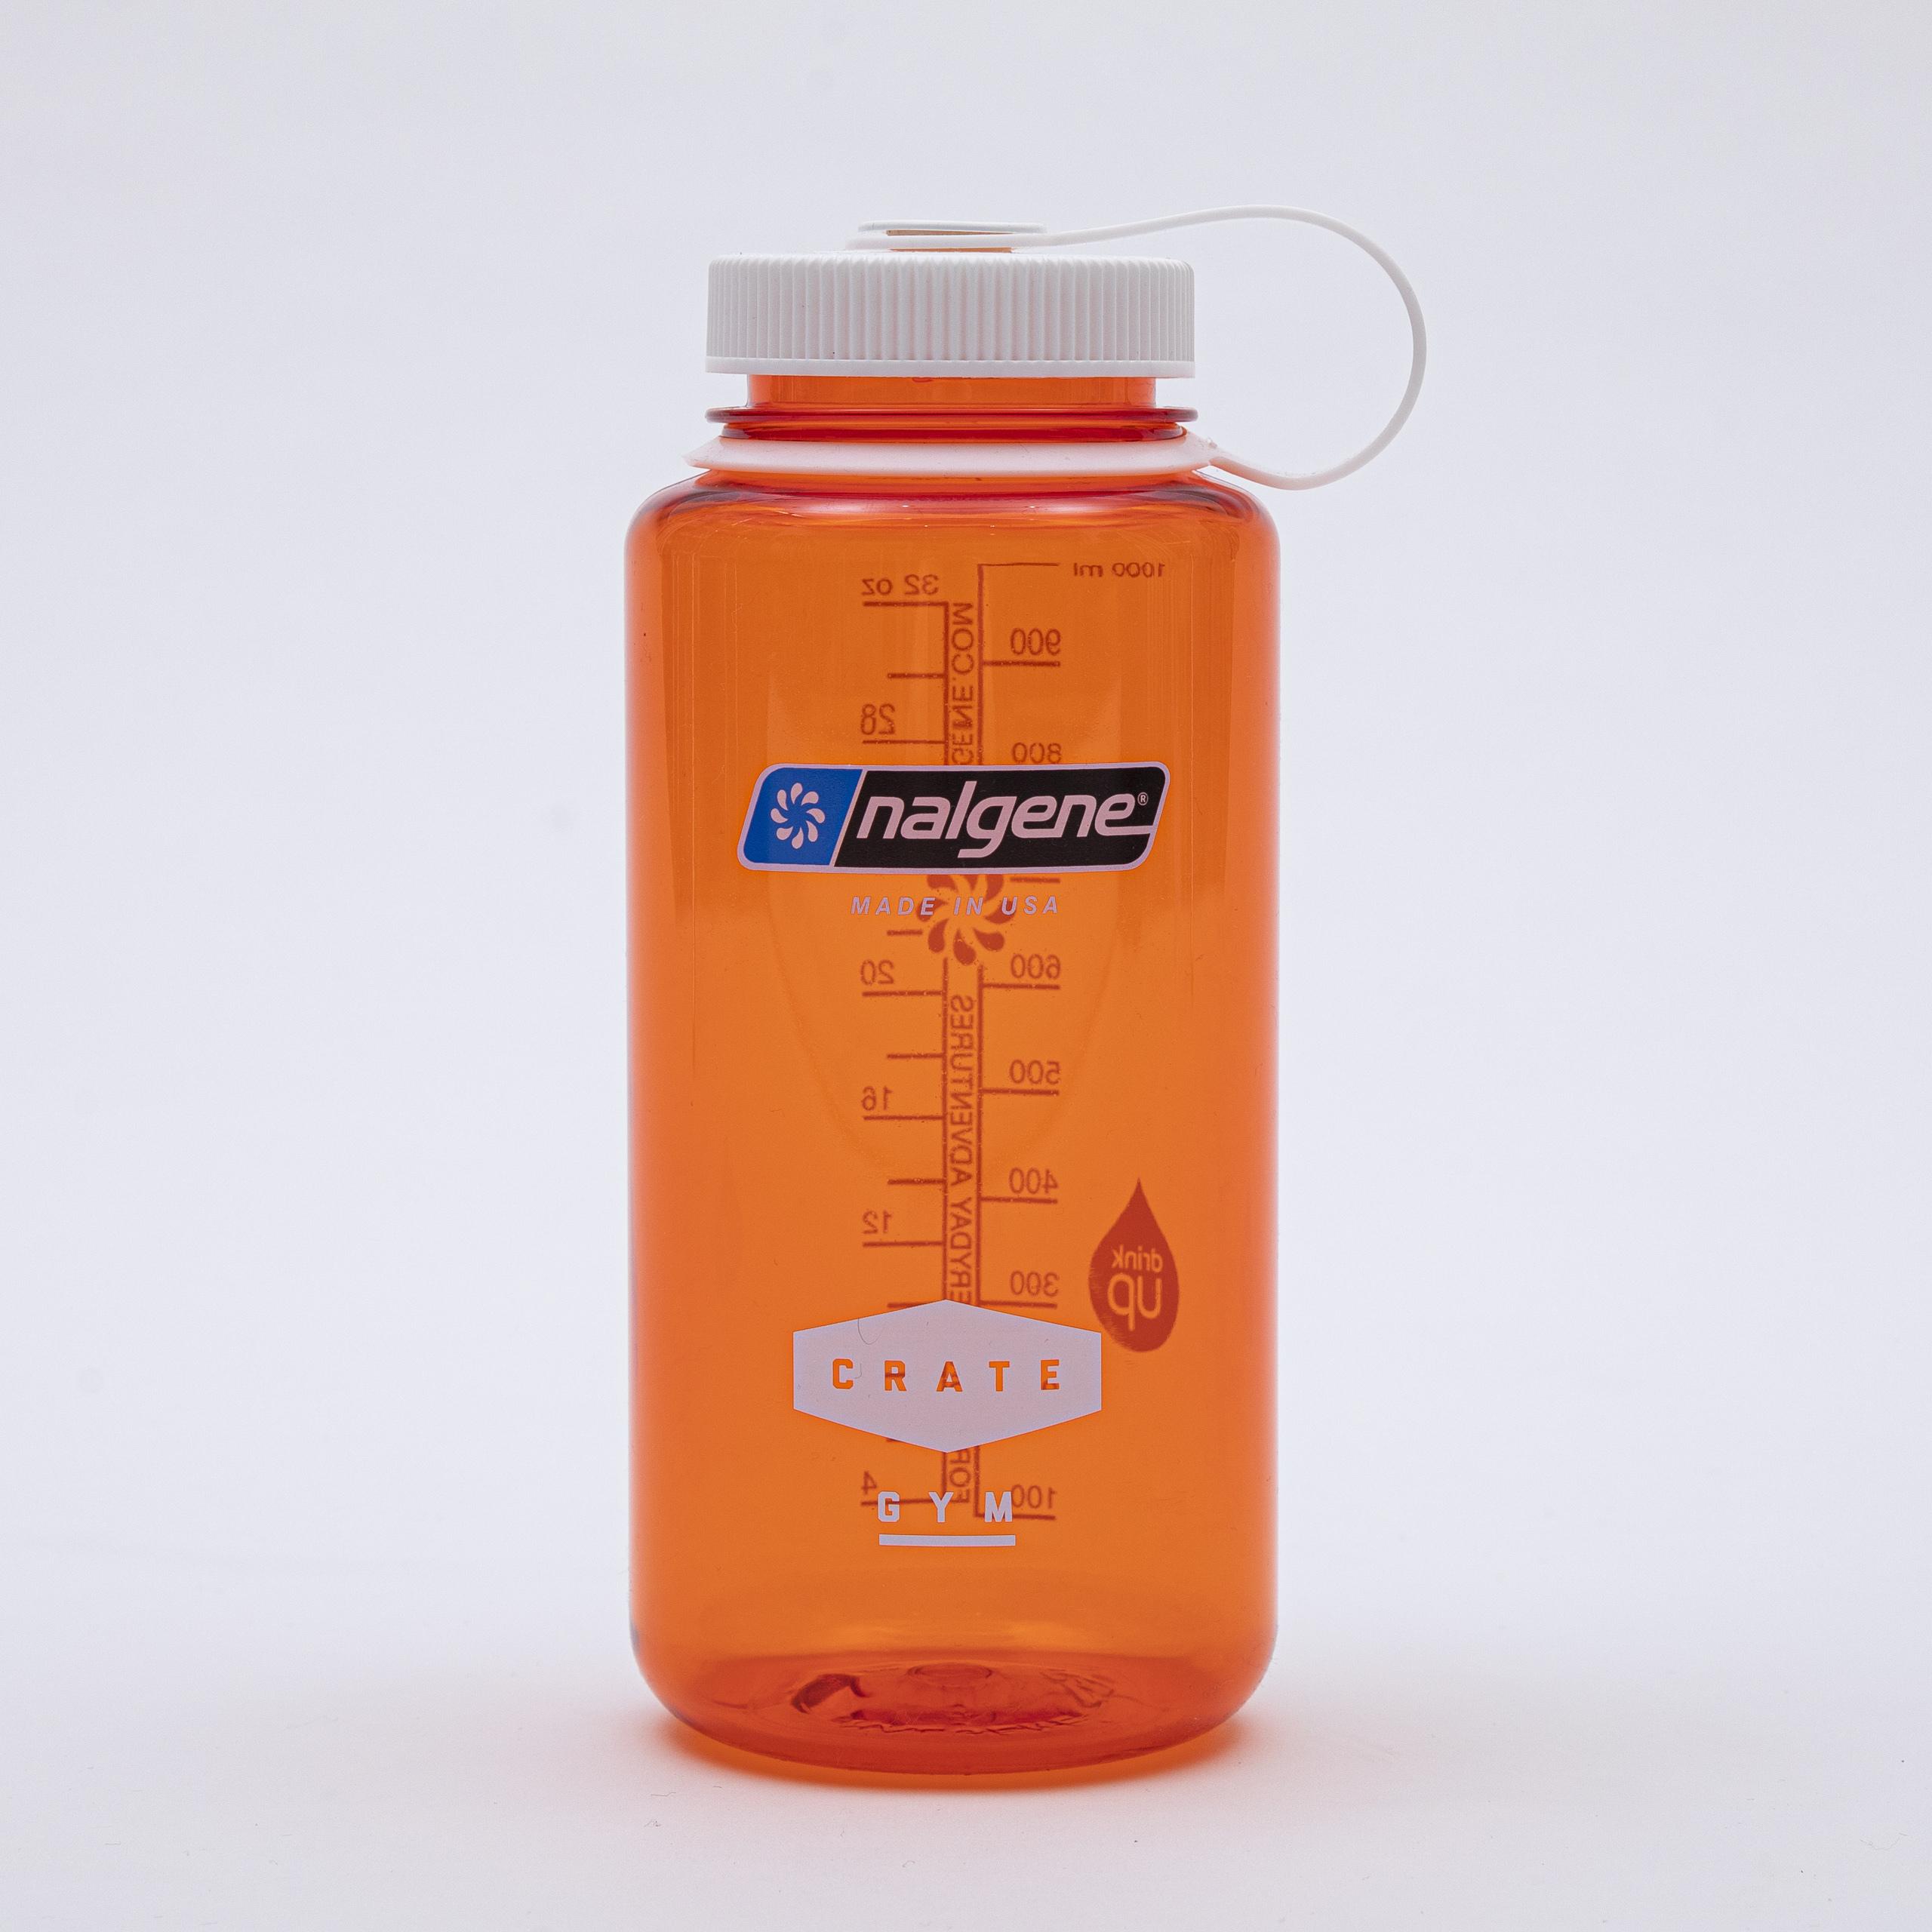 CRATE GYM Original Bottle nalgene